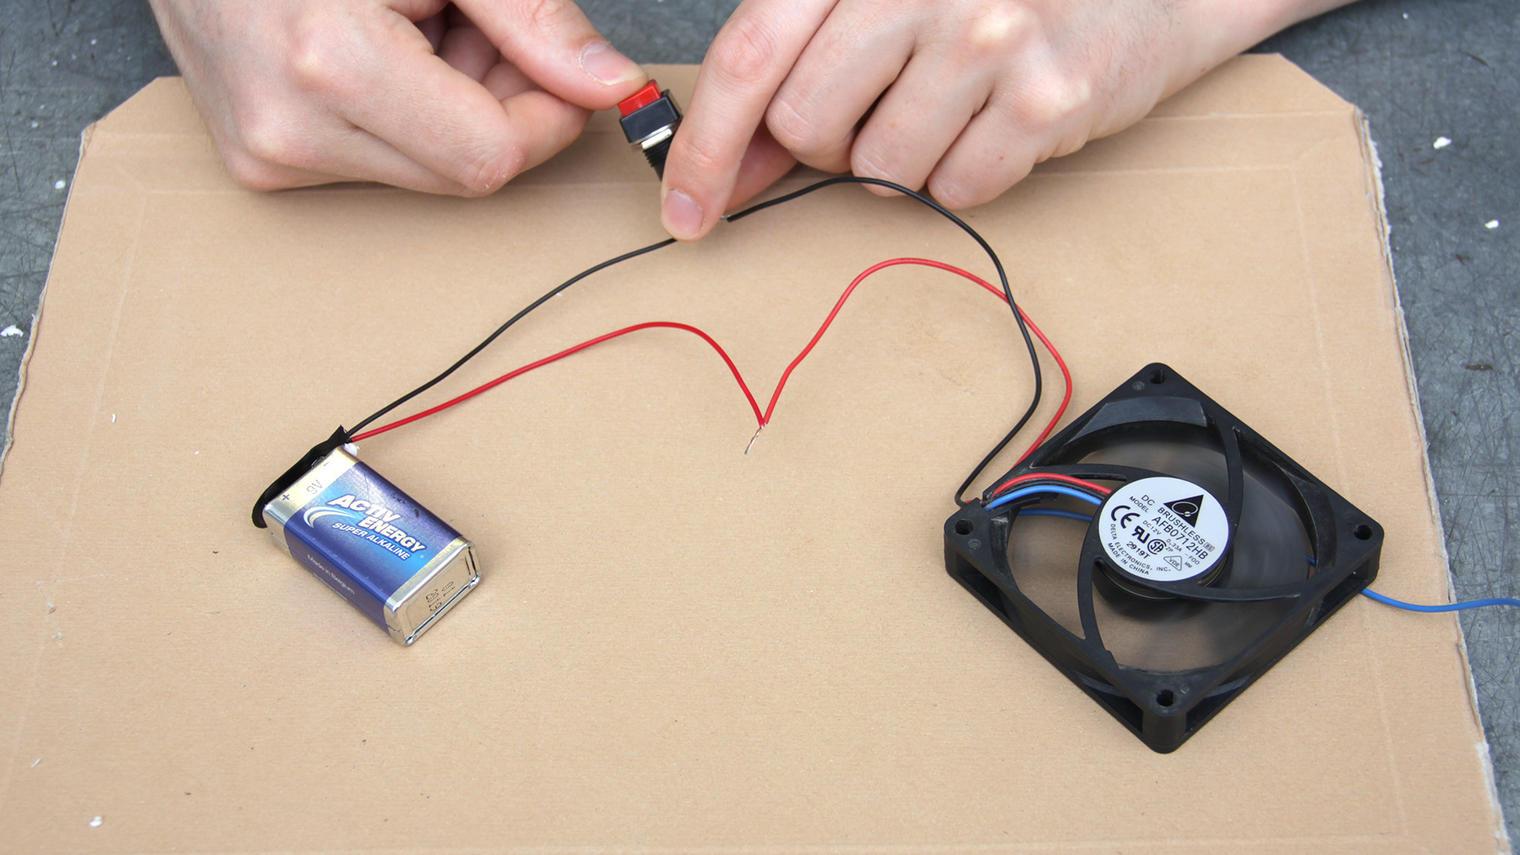 Stromkreis bauen | tuduu.org